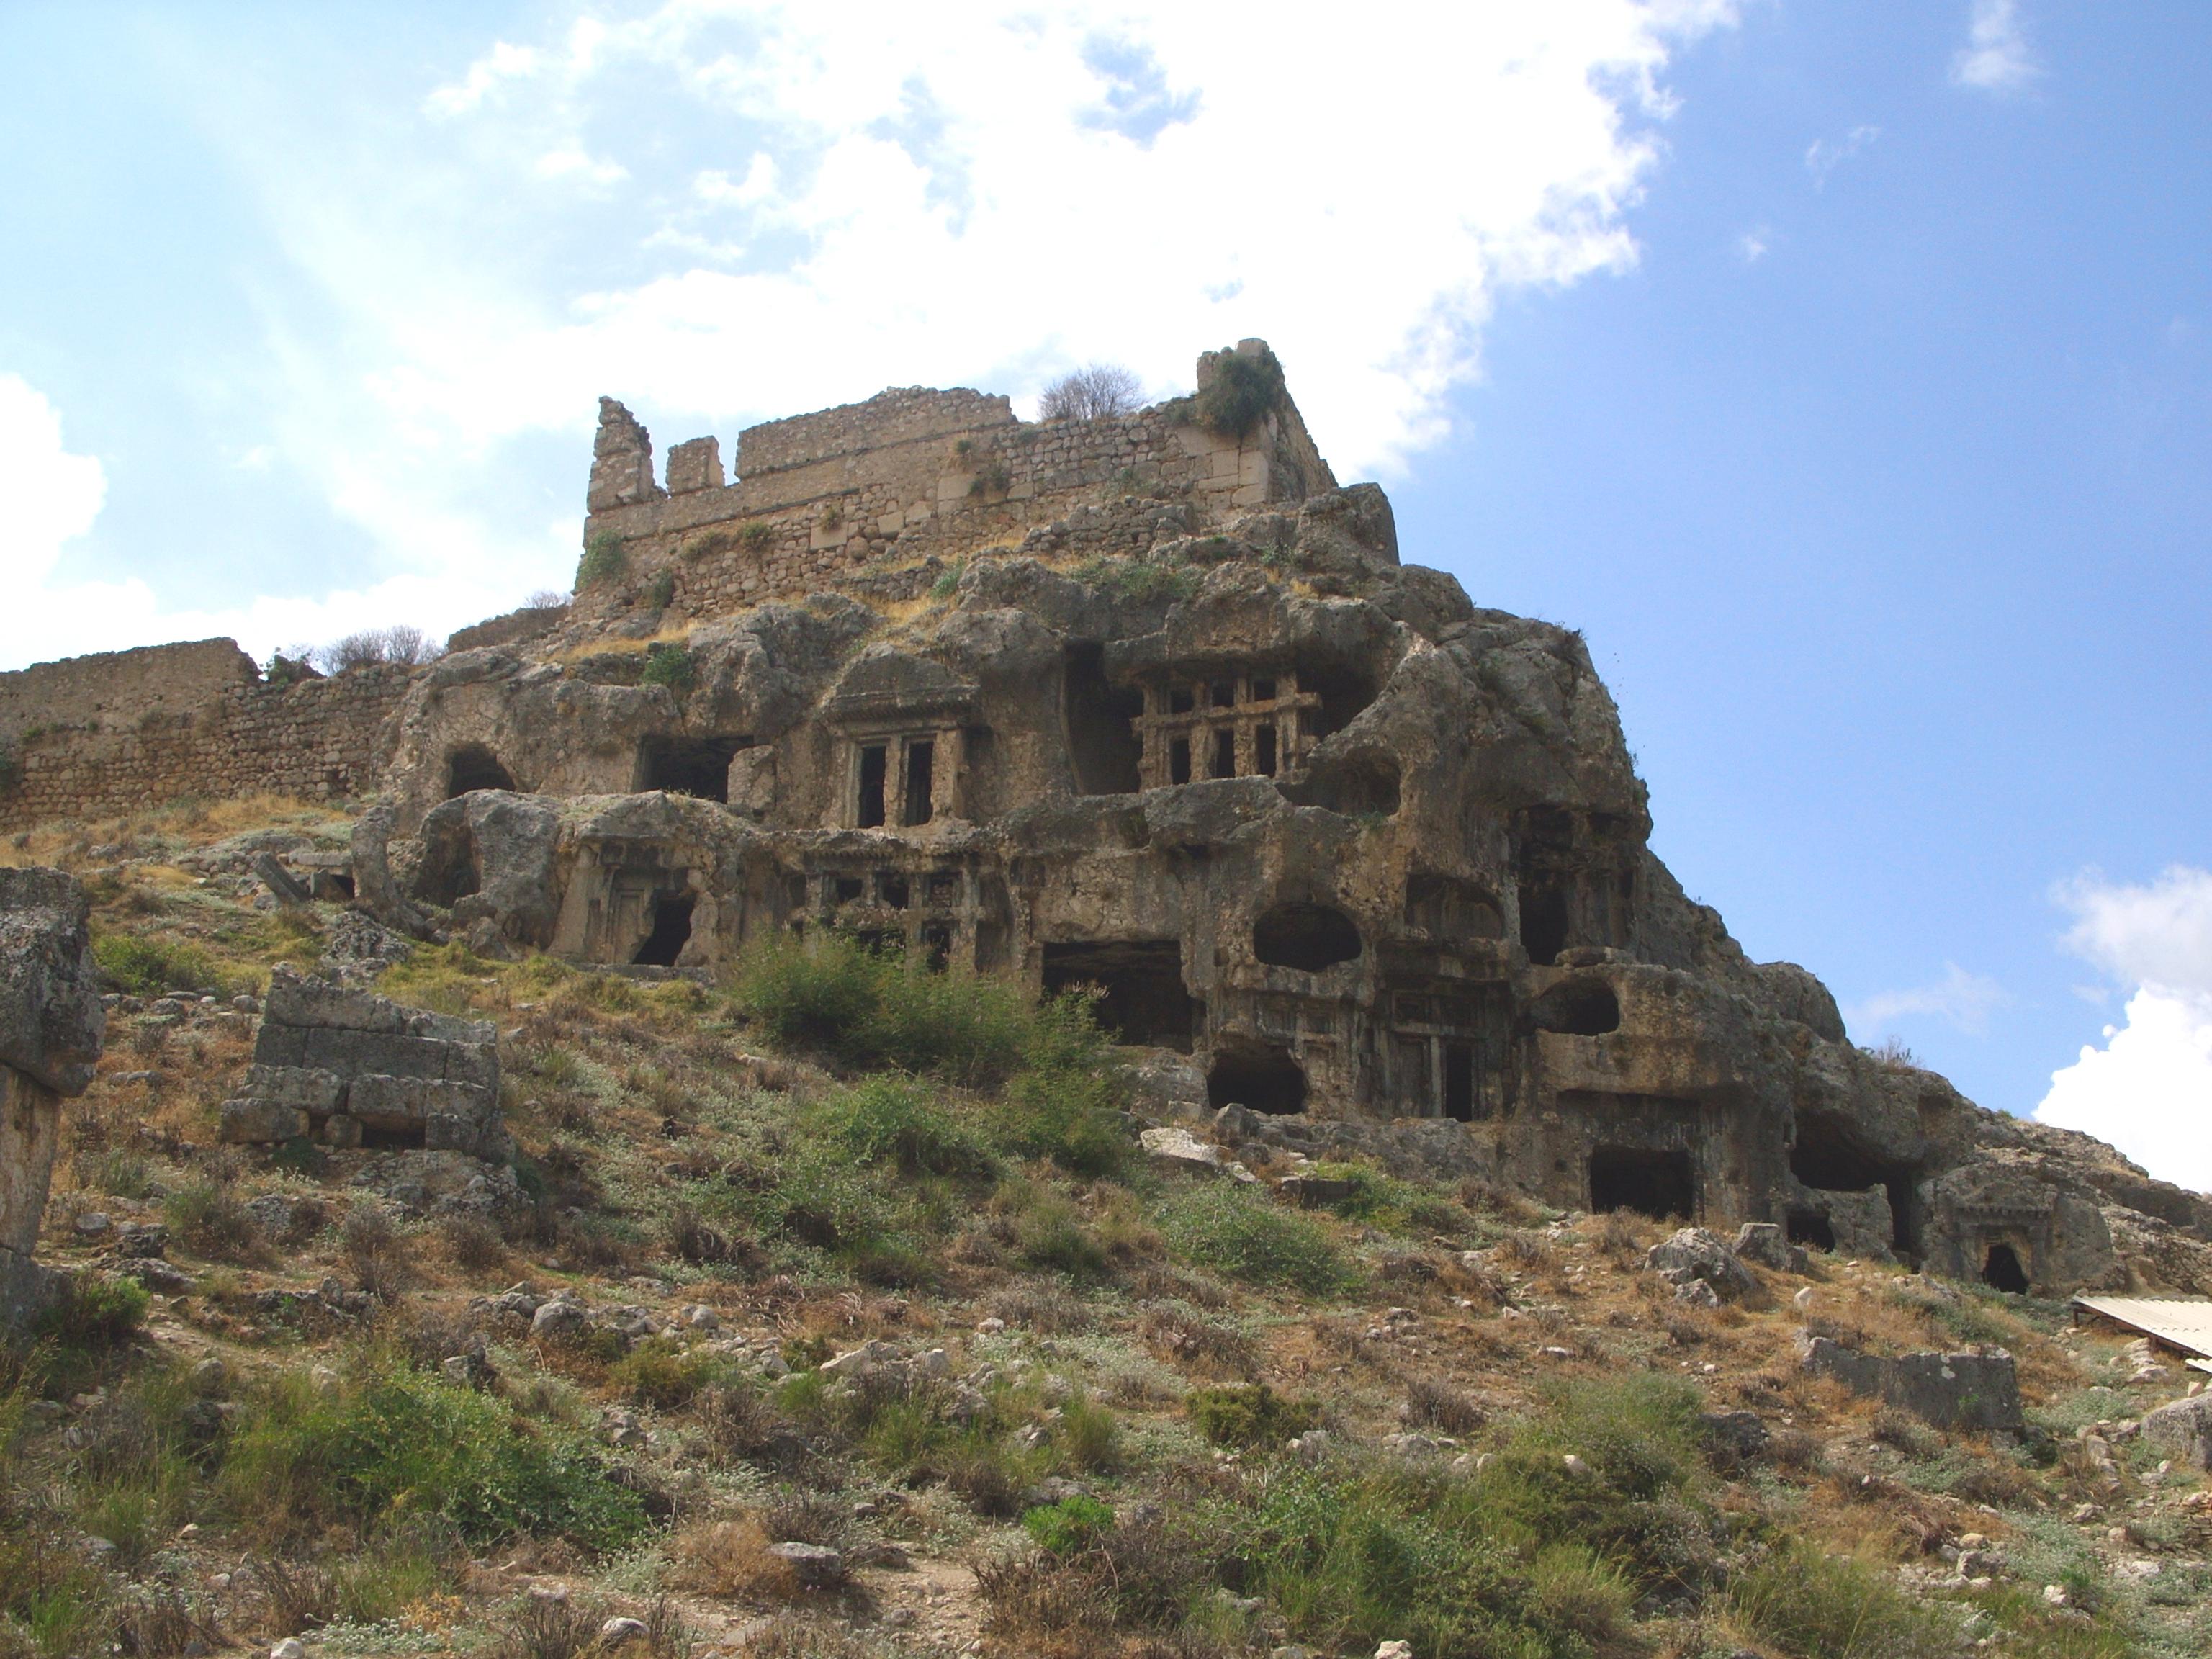 File:Tlos-tomb-ruins.jpg - Wikipedia